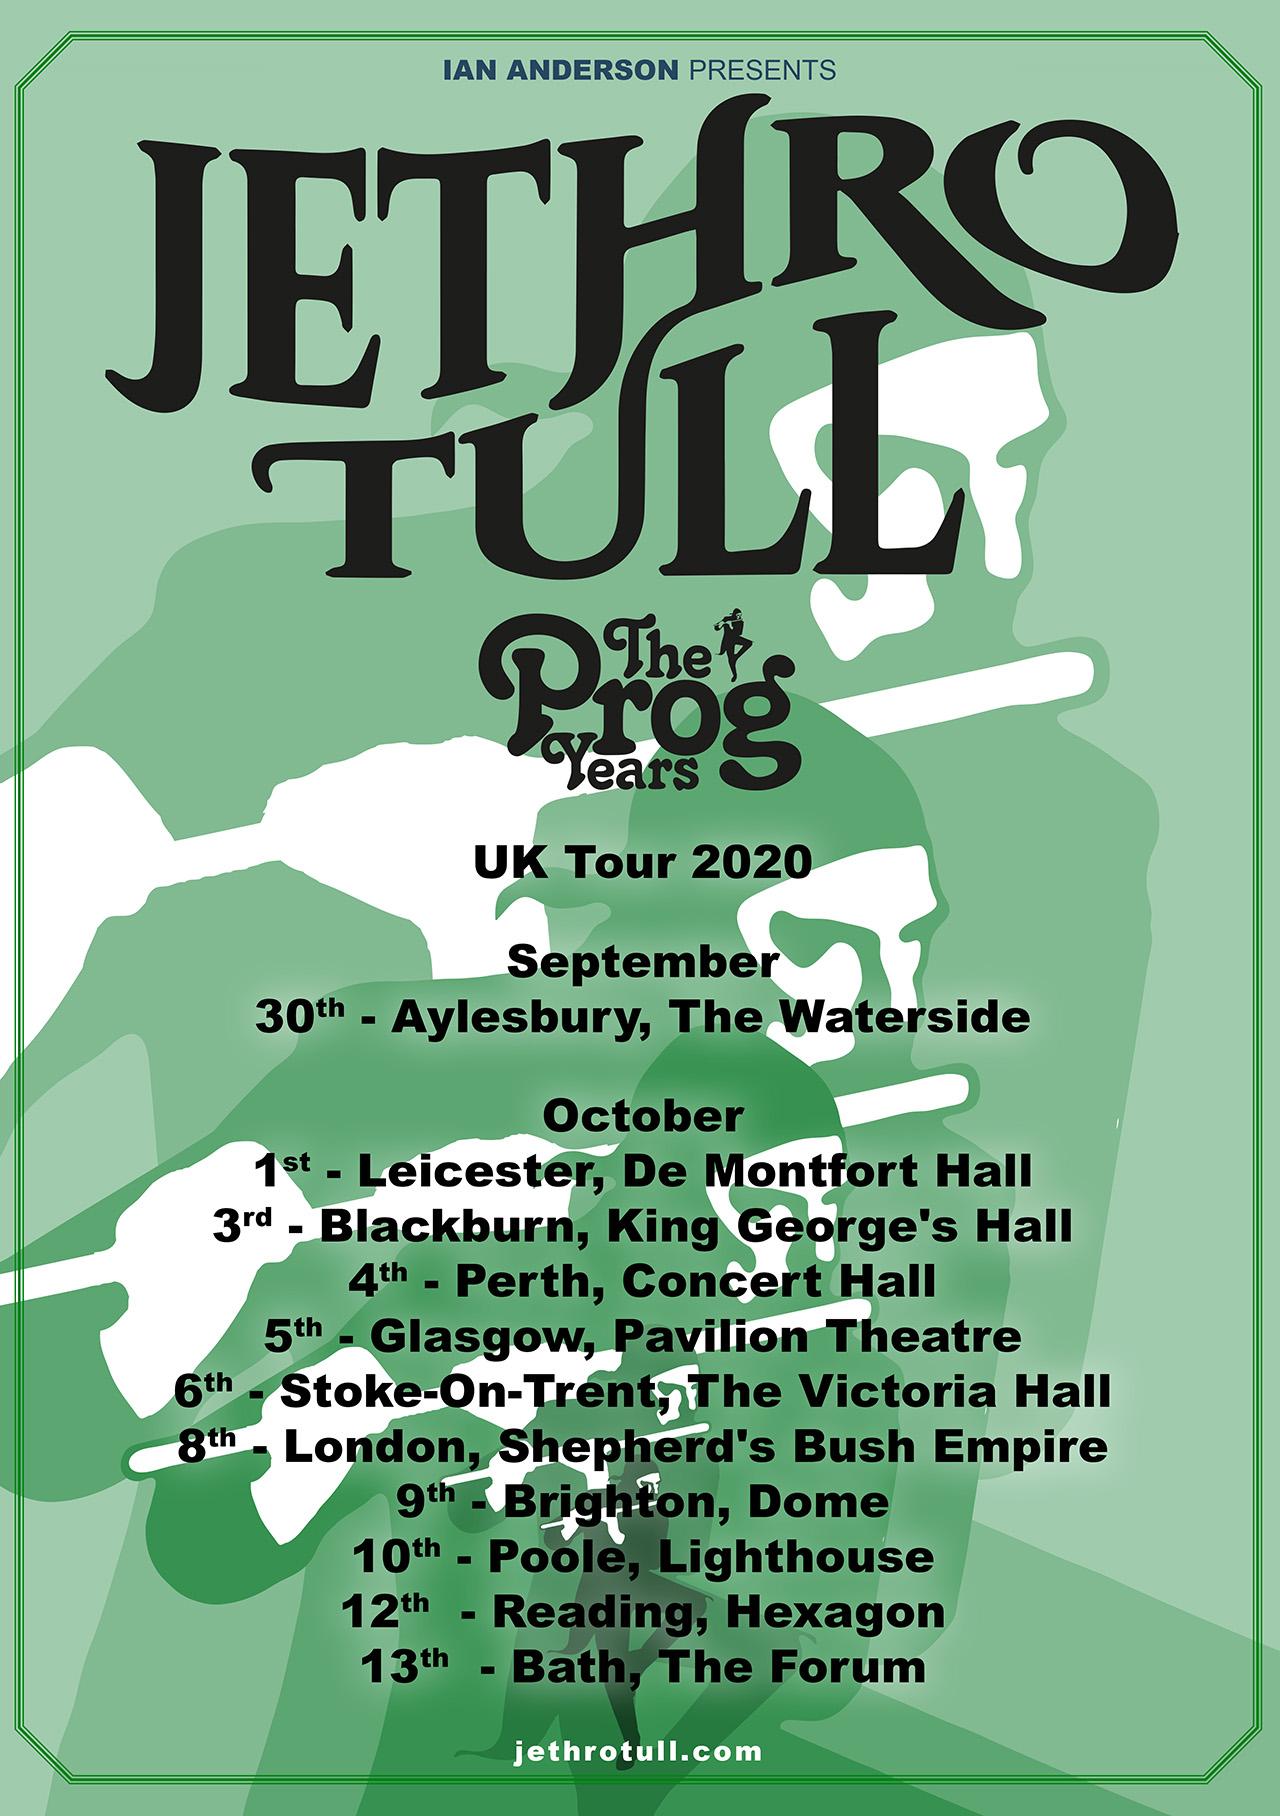 Jethro Tull: The Prog Years Tour set for 2020   Louder